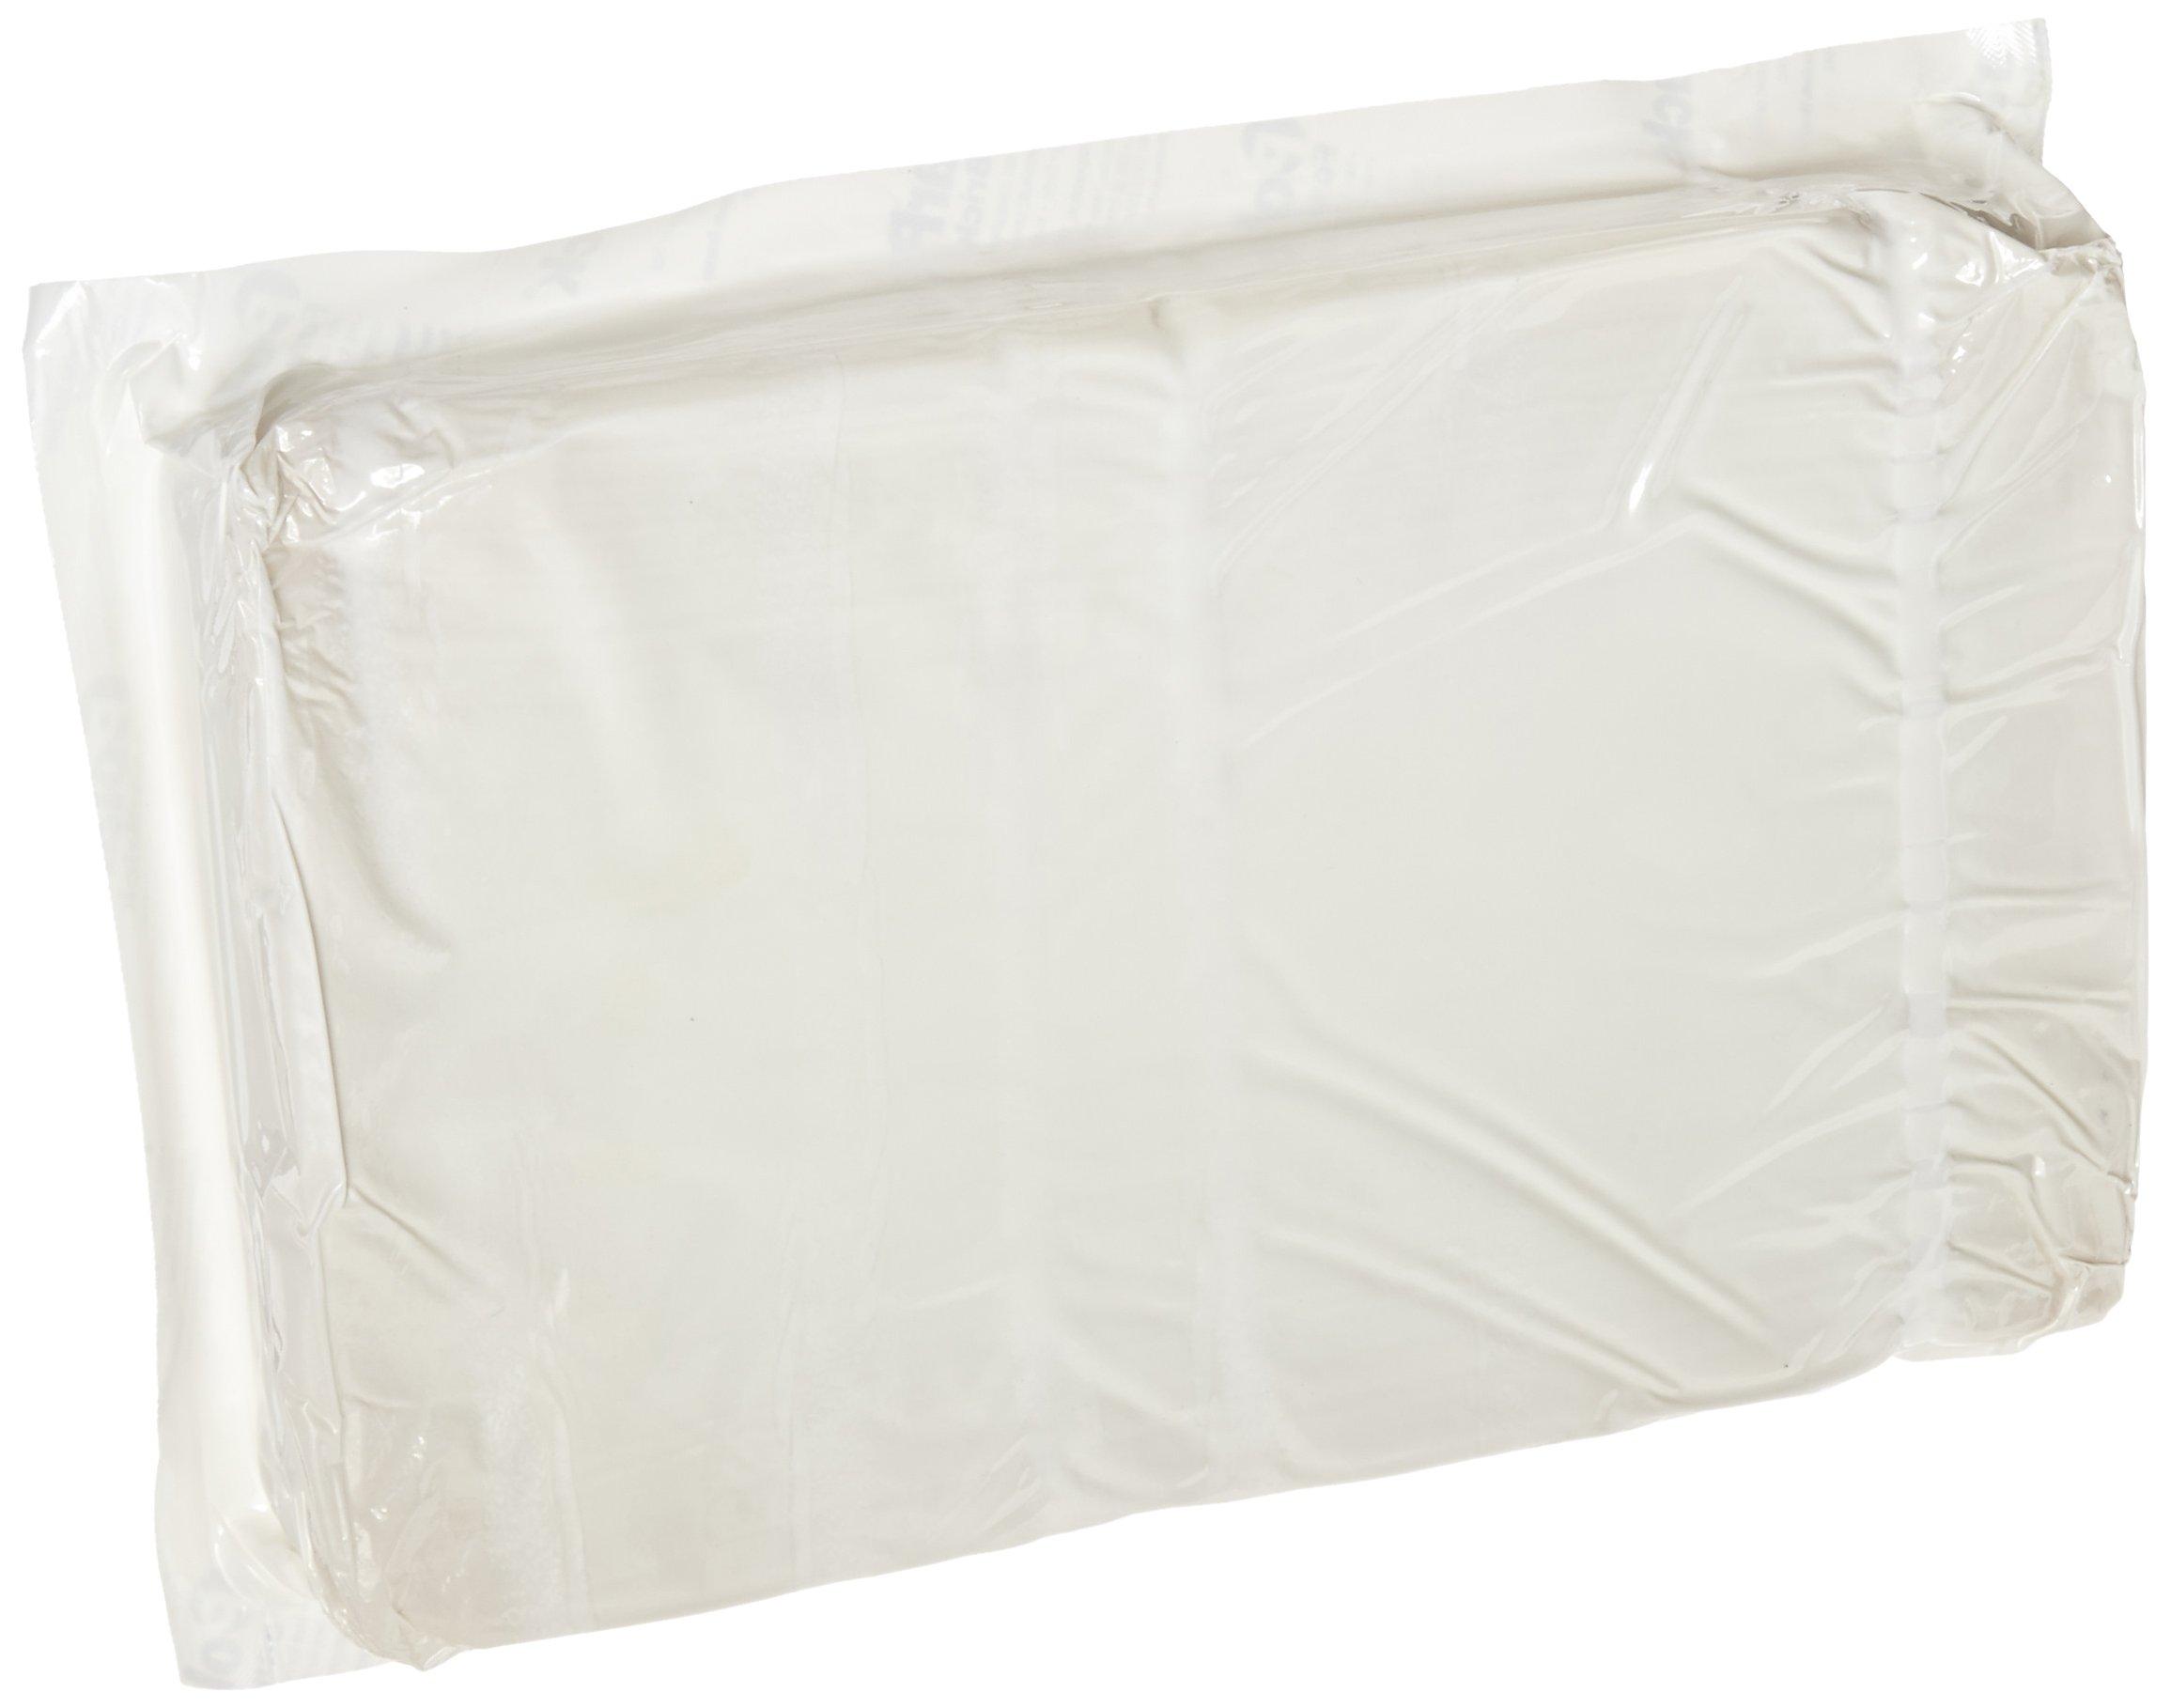 ThermoSafe Polar Pack FPP64 Foam Brick Refrigerant Gel Pack, 0°C Temperature, 10.5'' L x 6.5'' W x 1.75'' H (Case of 10)